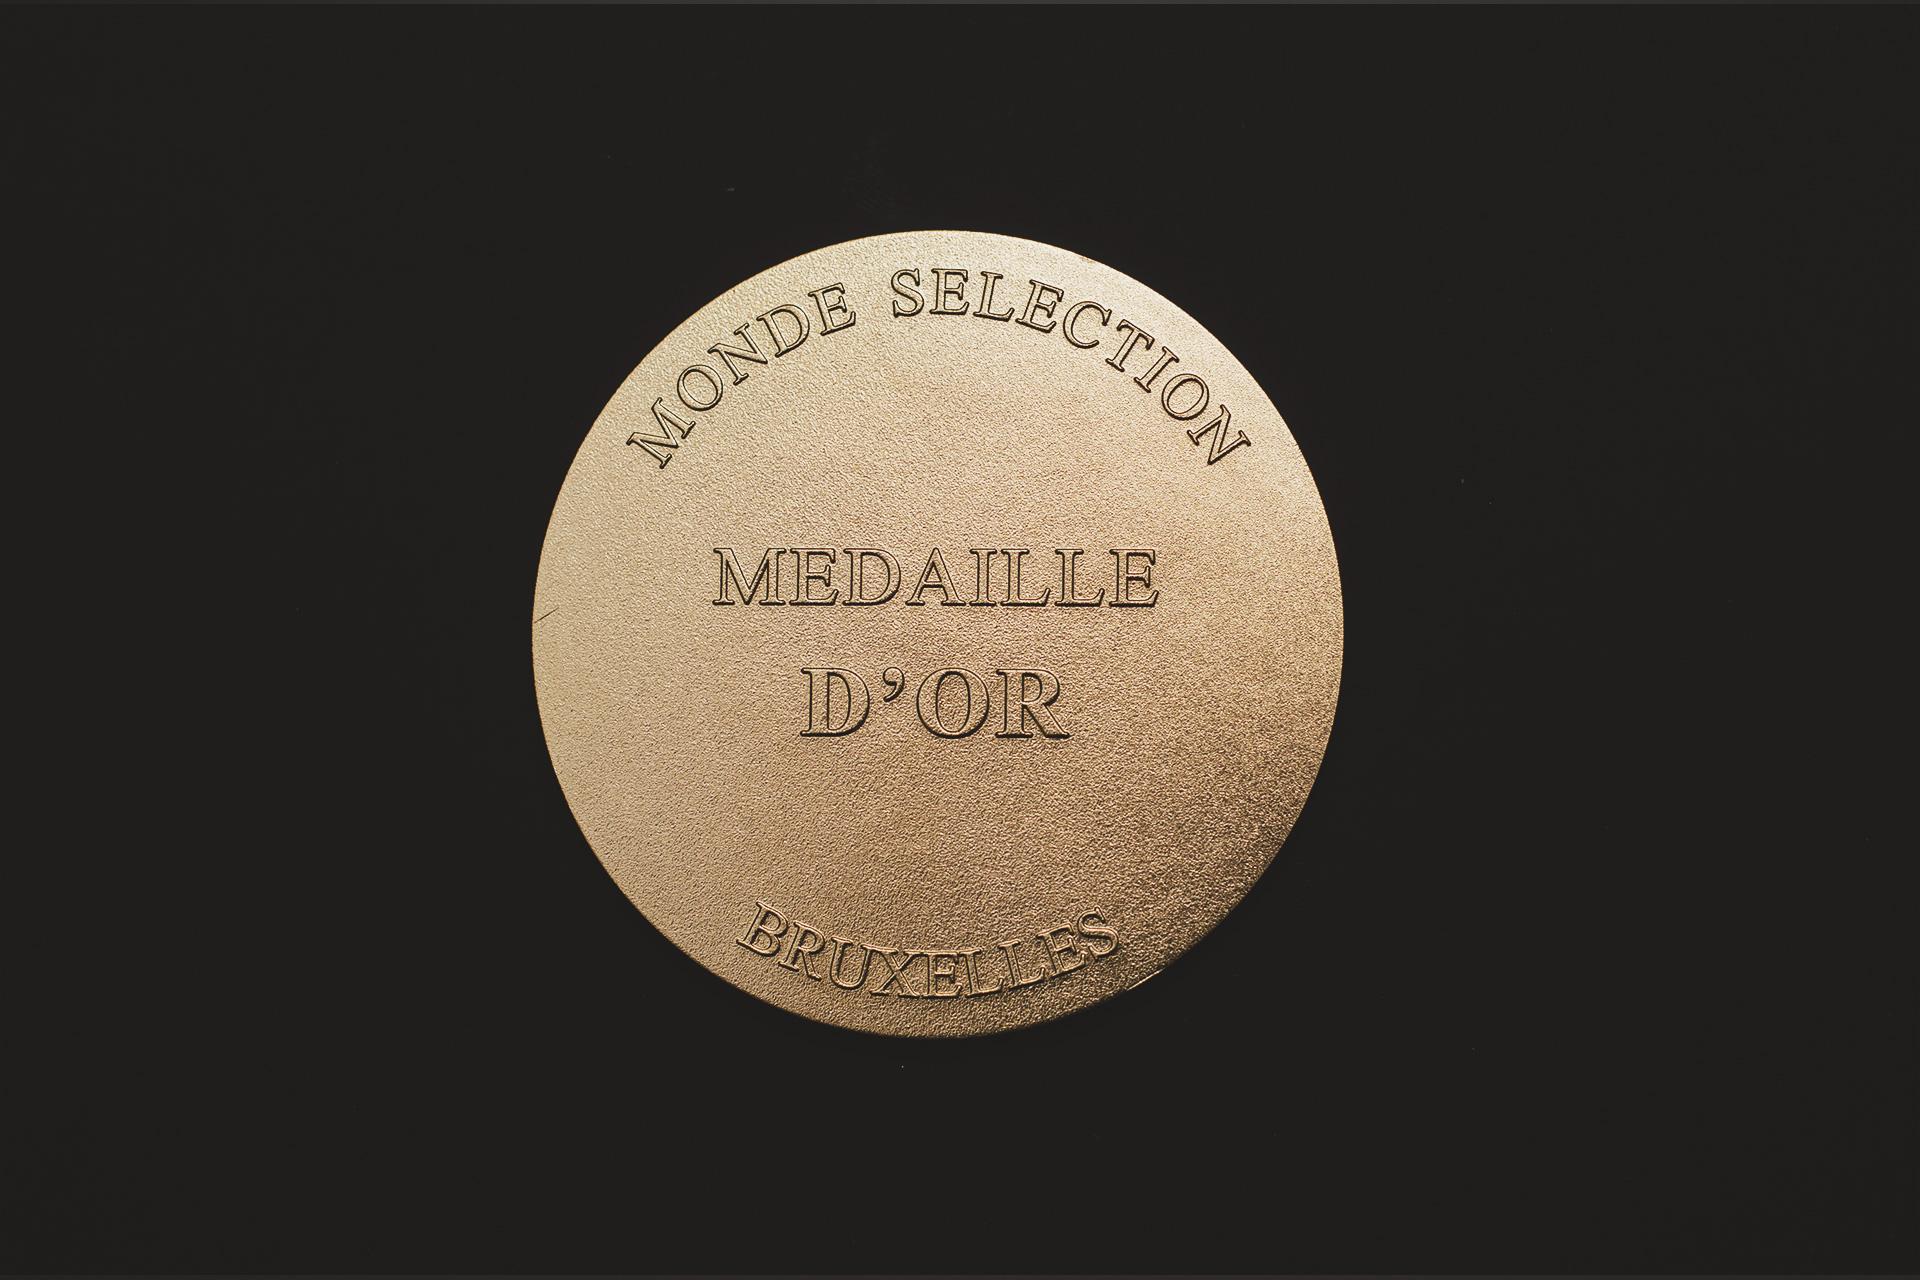 medaliibg1